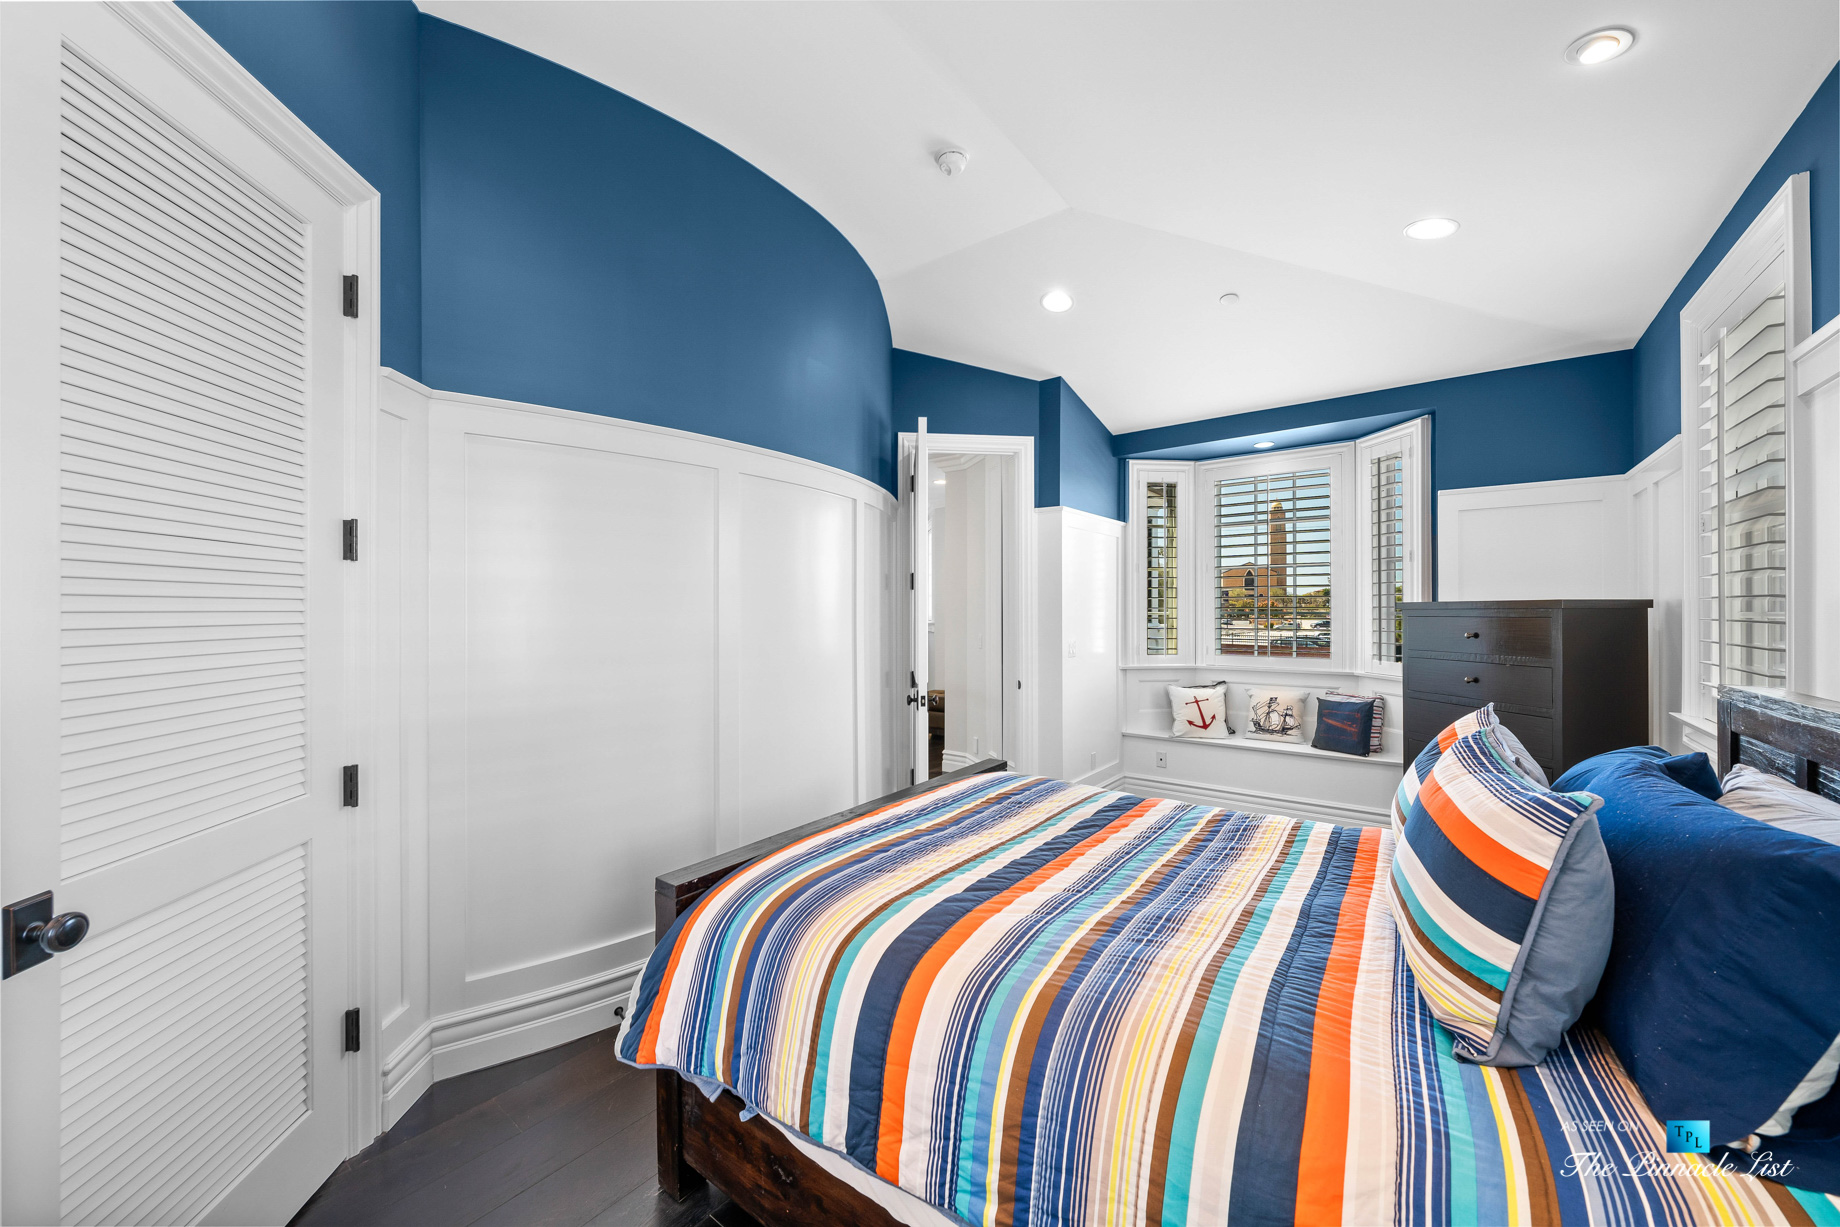 1412 Laurel Ave, Manhattan Beach, CA, USA - Bedroom